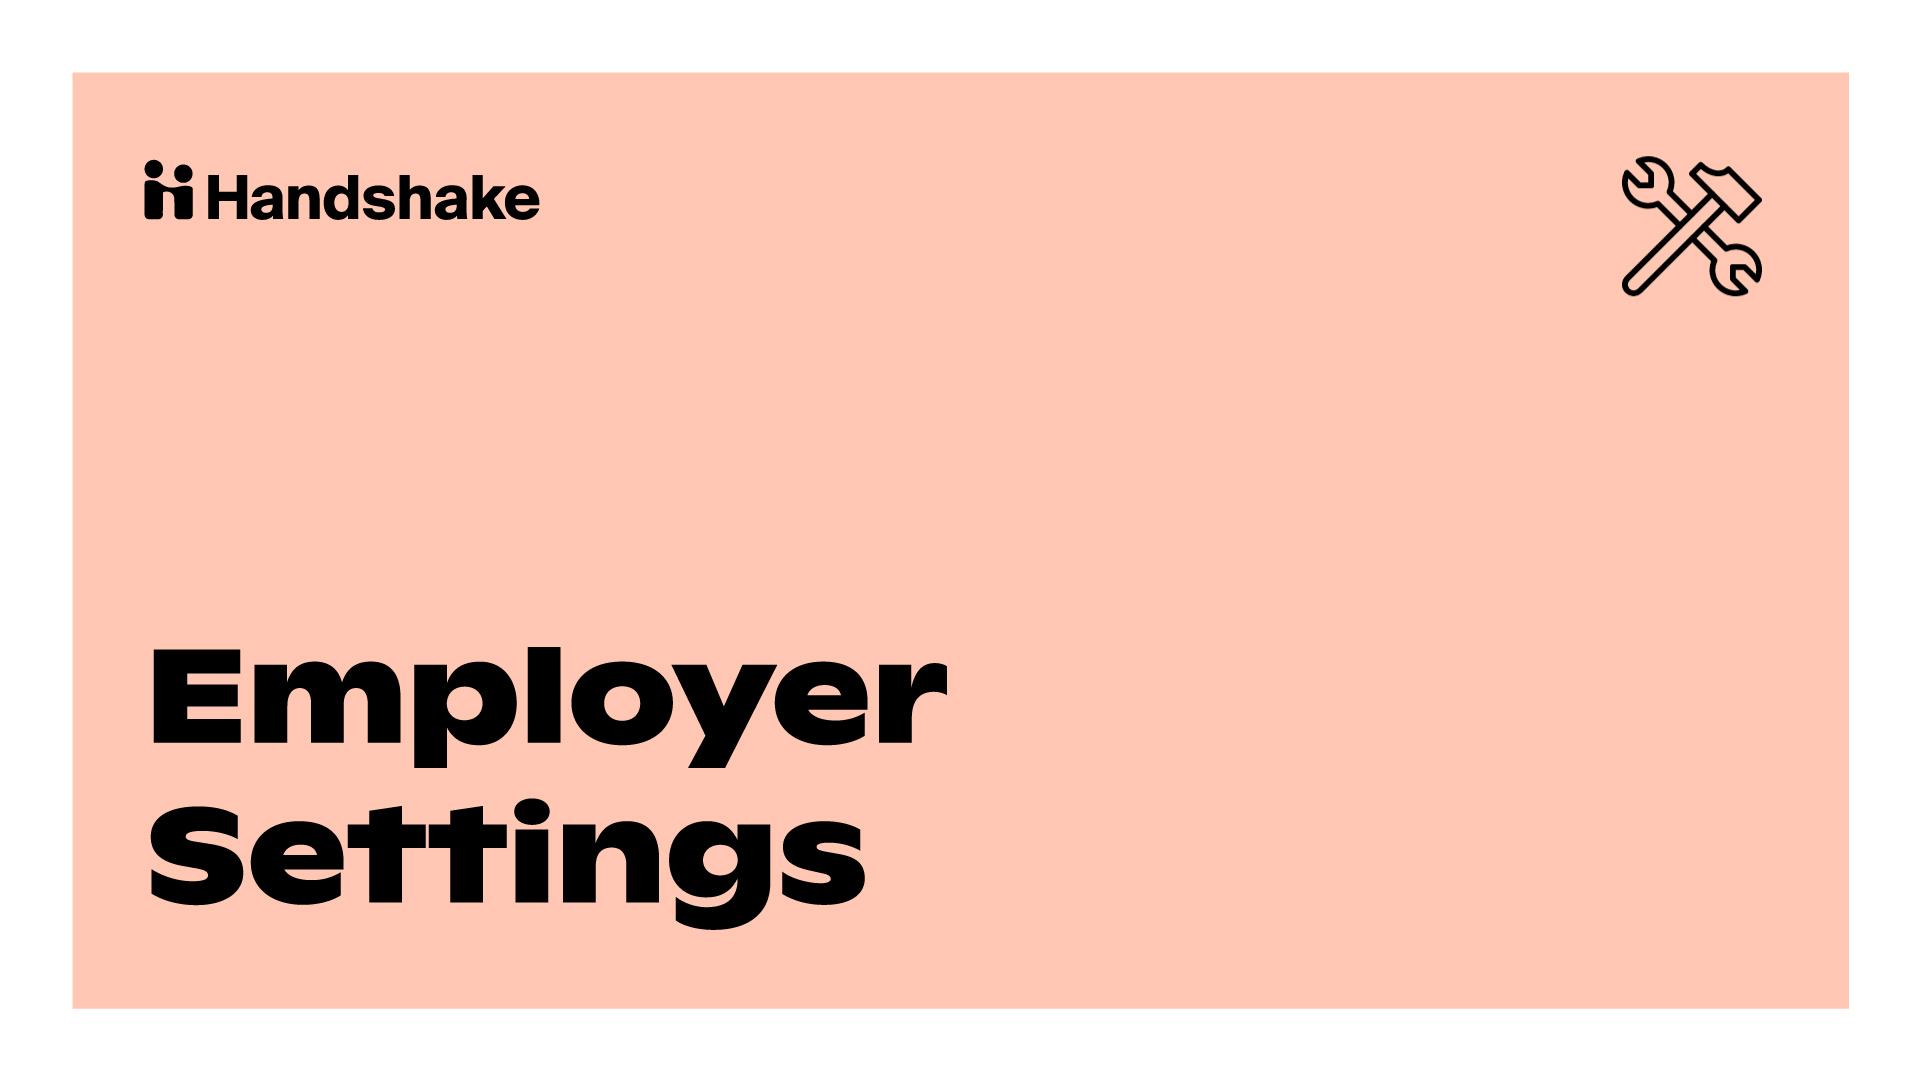 Milestone 4: Employer Settings